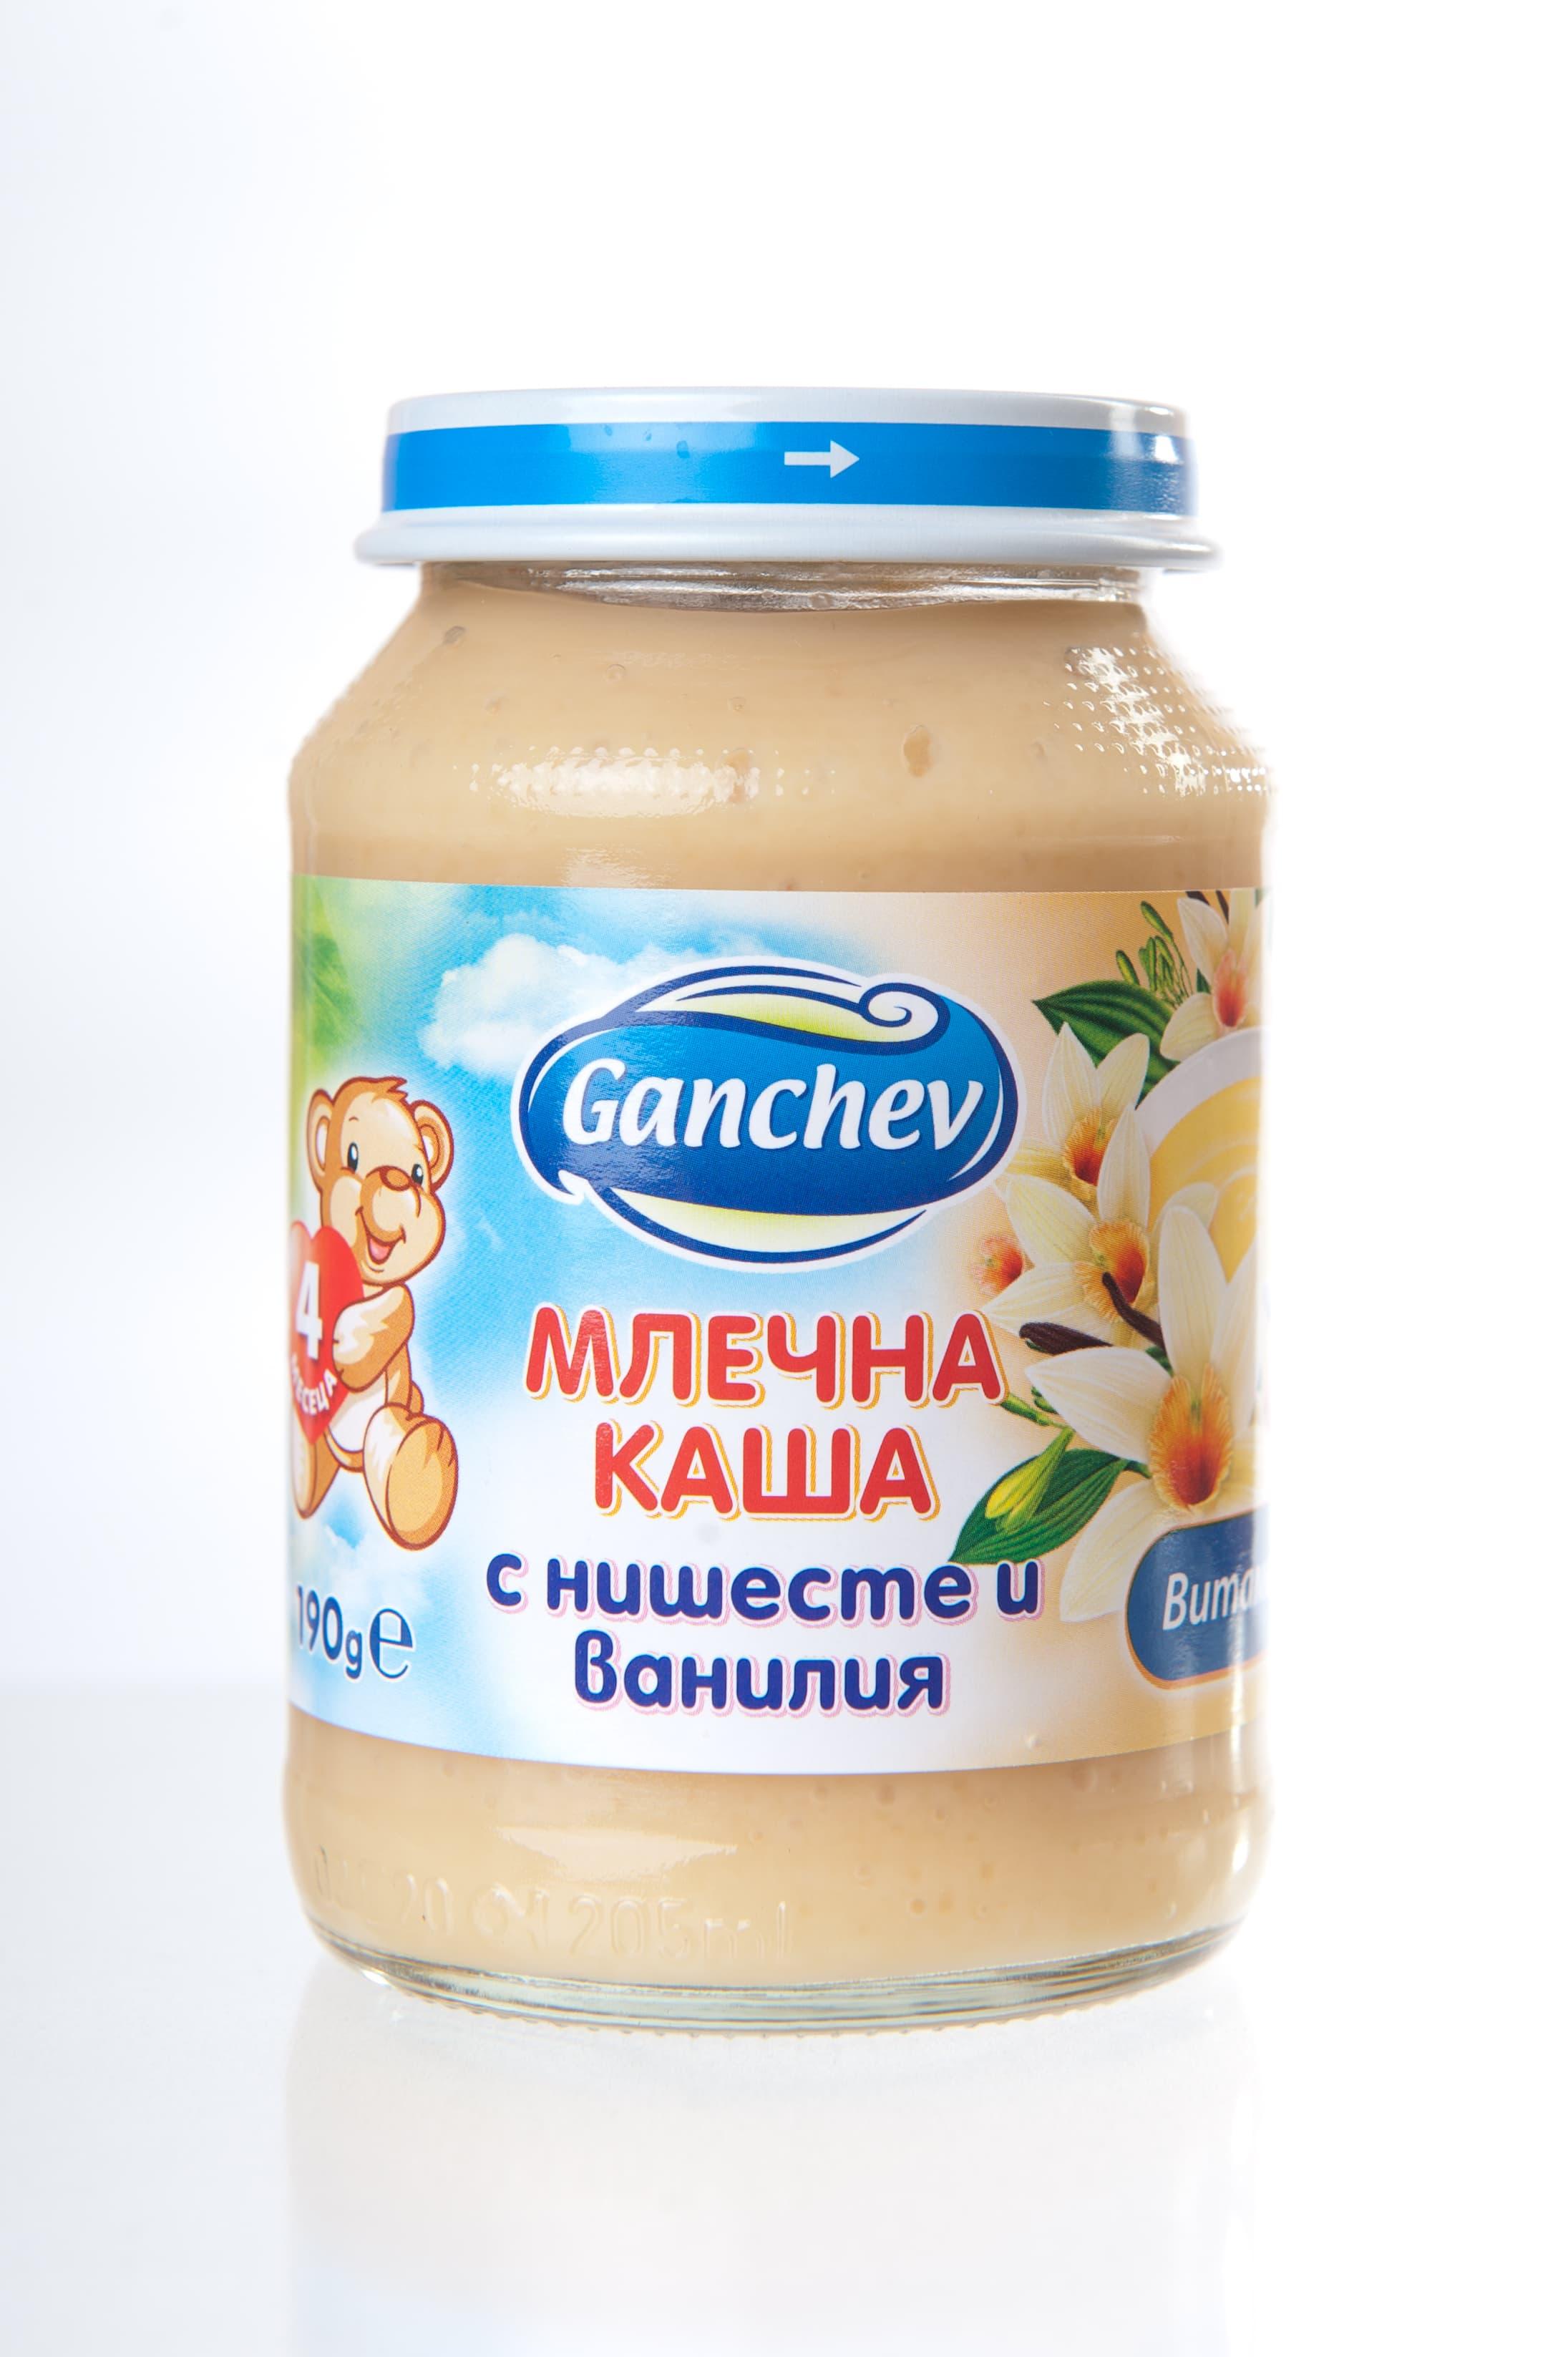 Ganchev-млечна каша с нишесте и ванилия 4м+190гр